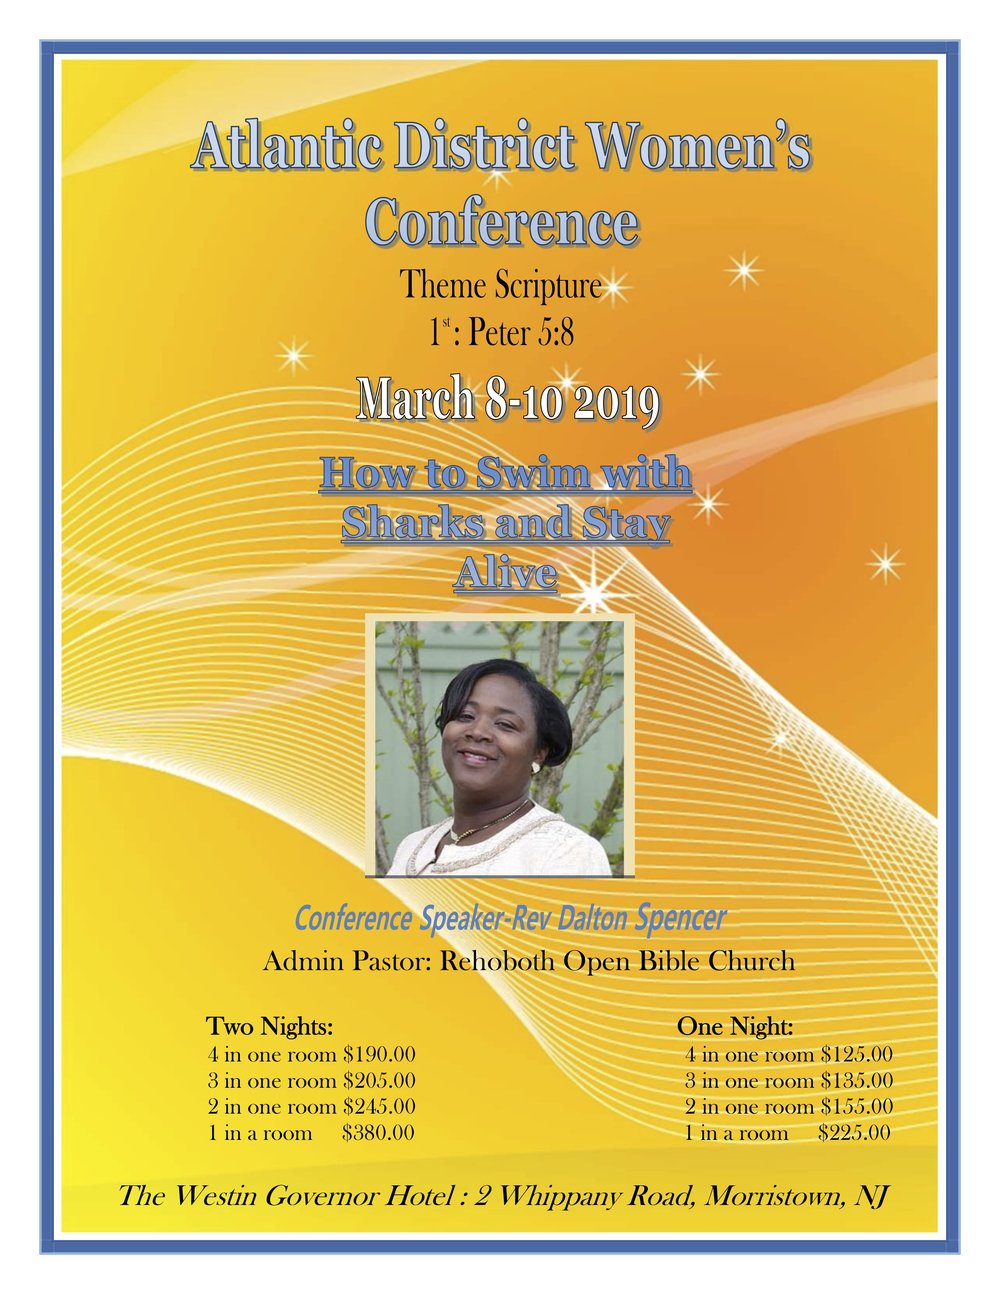 Atlantic District Women's Conference Flyer 2019 - 1.jpg